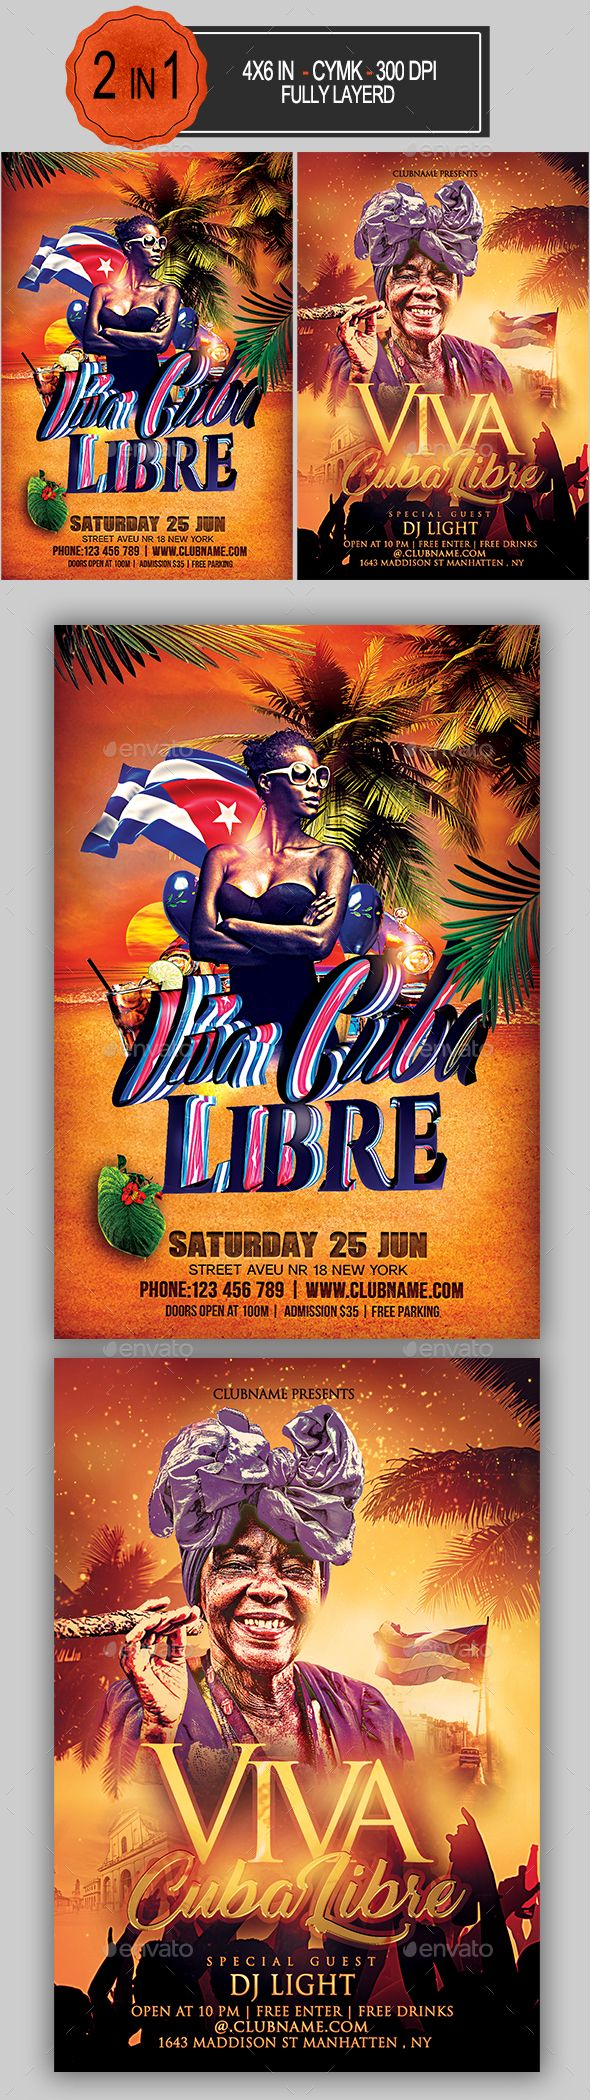 Viva Cuba Libre Flyer Bundle #cubalibre